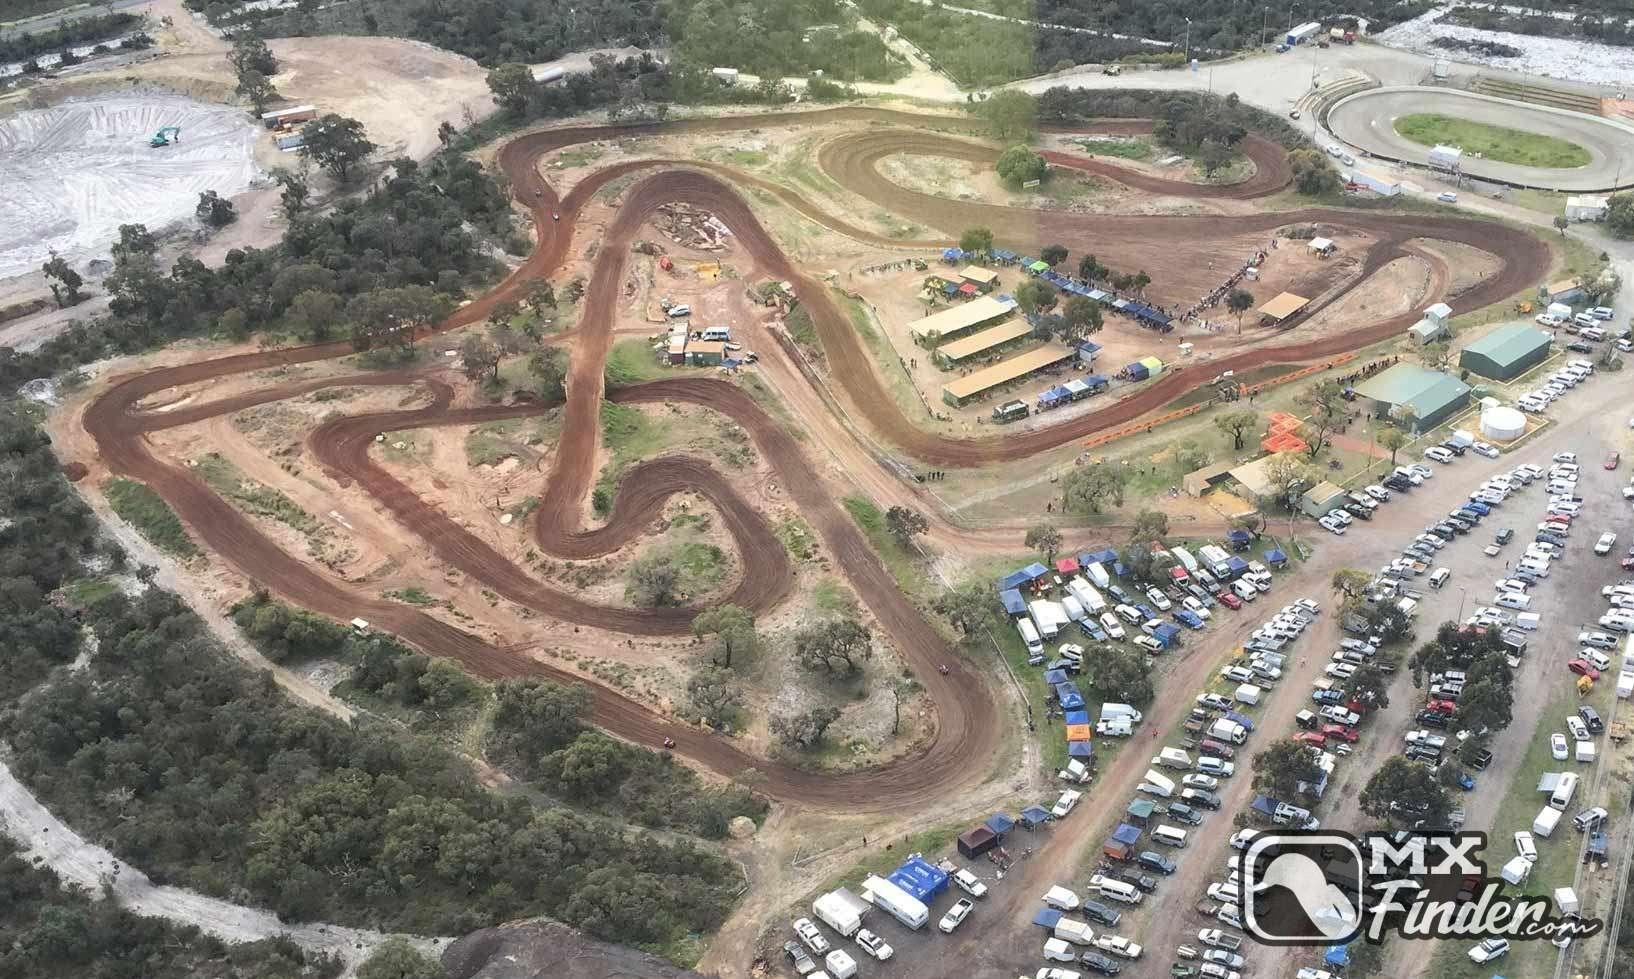 motocross, Wanneroo Junior Motocross Club, Neerabup, motocross track